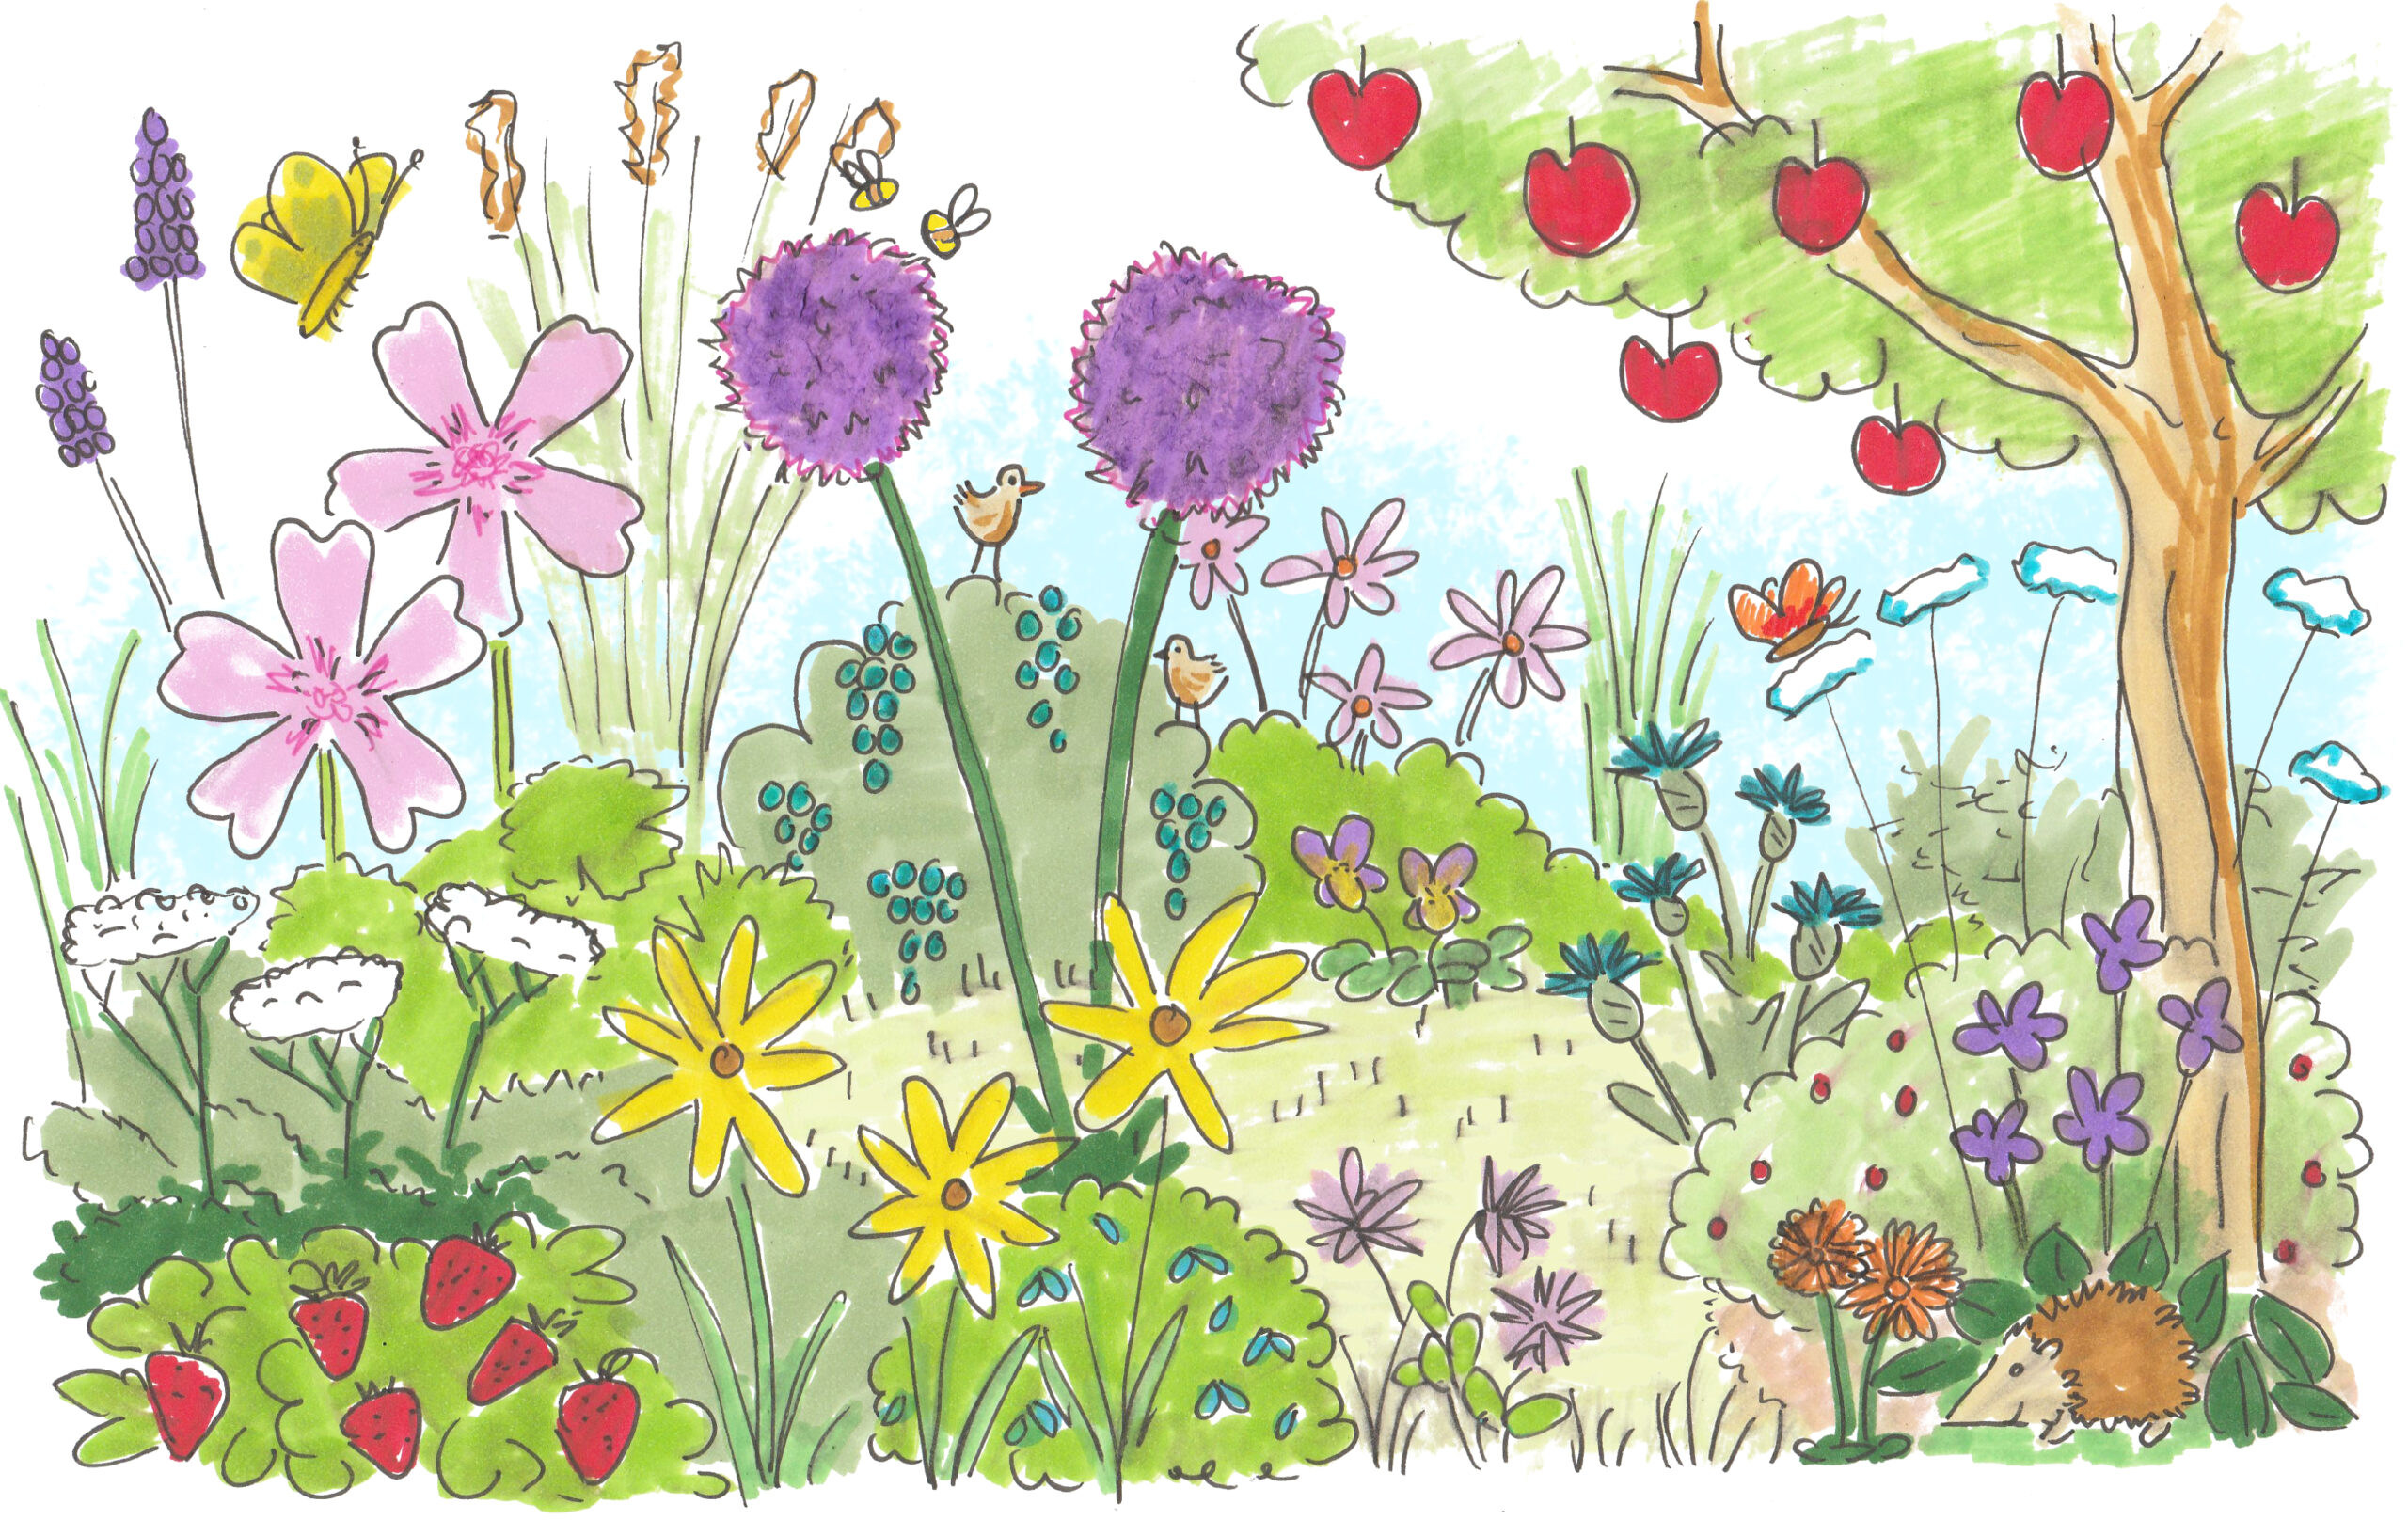 Tuinrecept illustratie overvloed permacultuur tuinontwerp